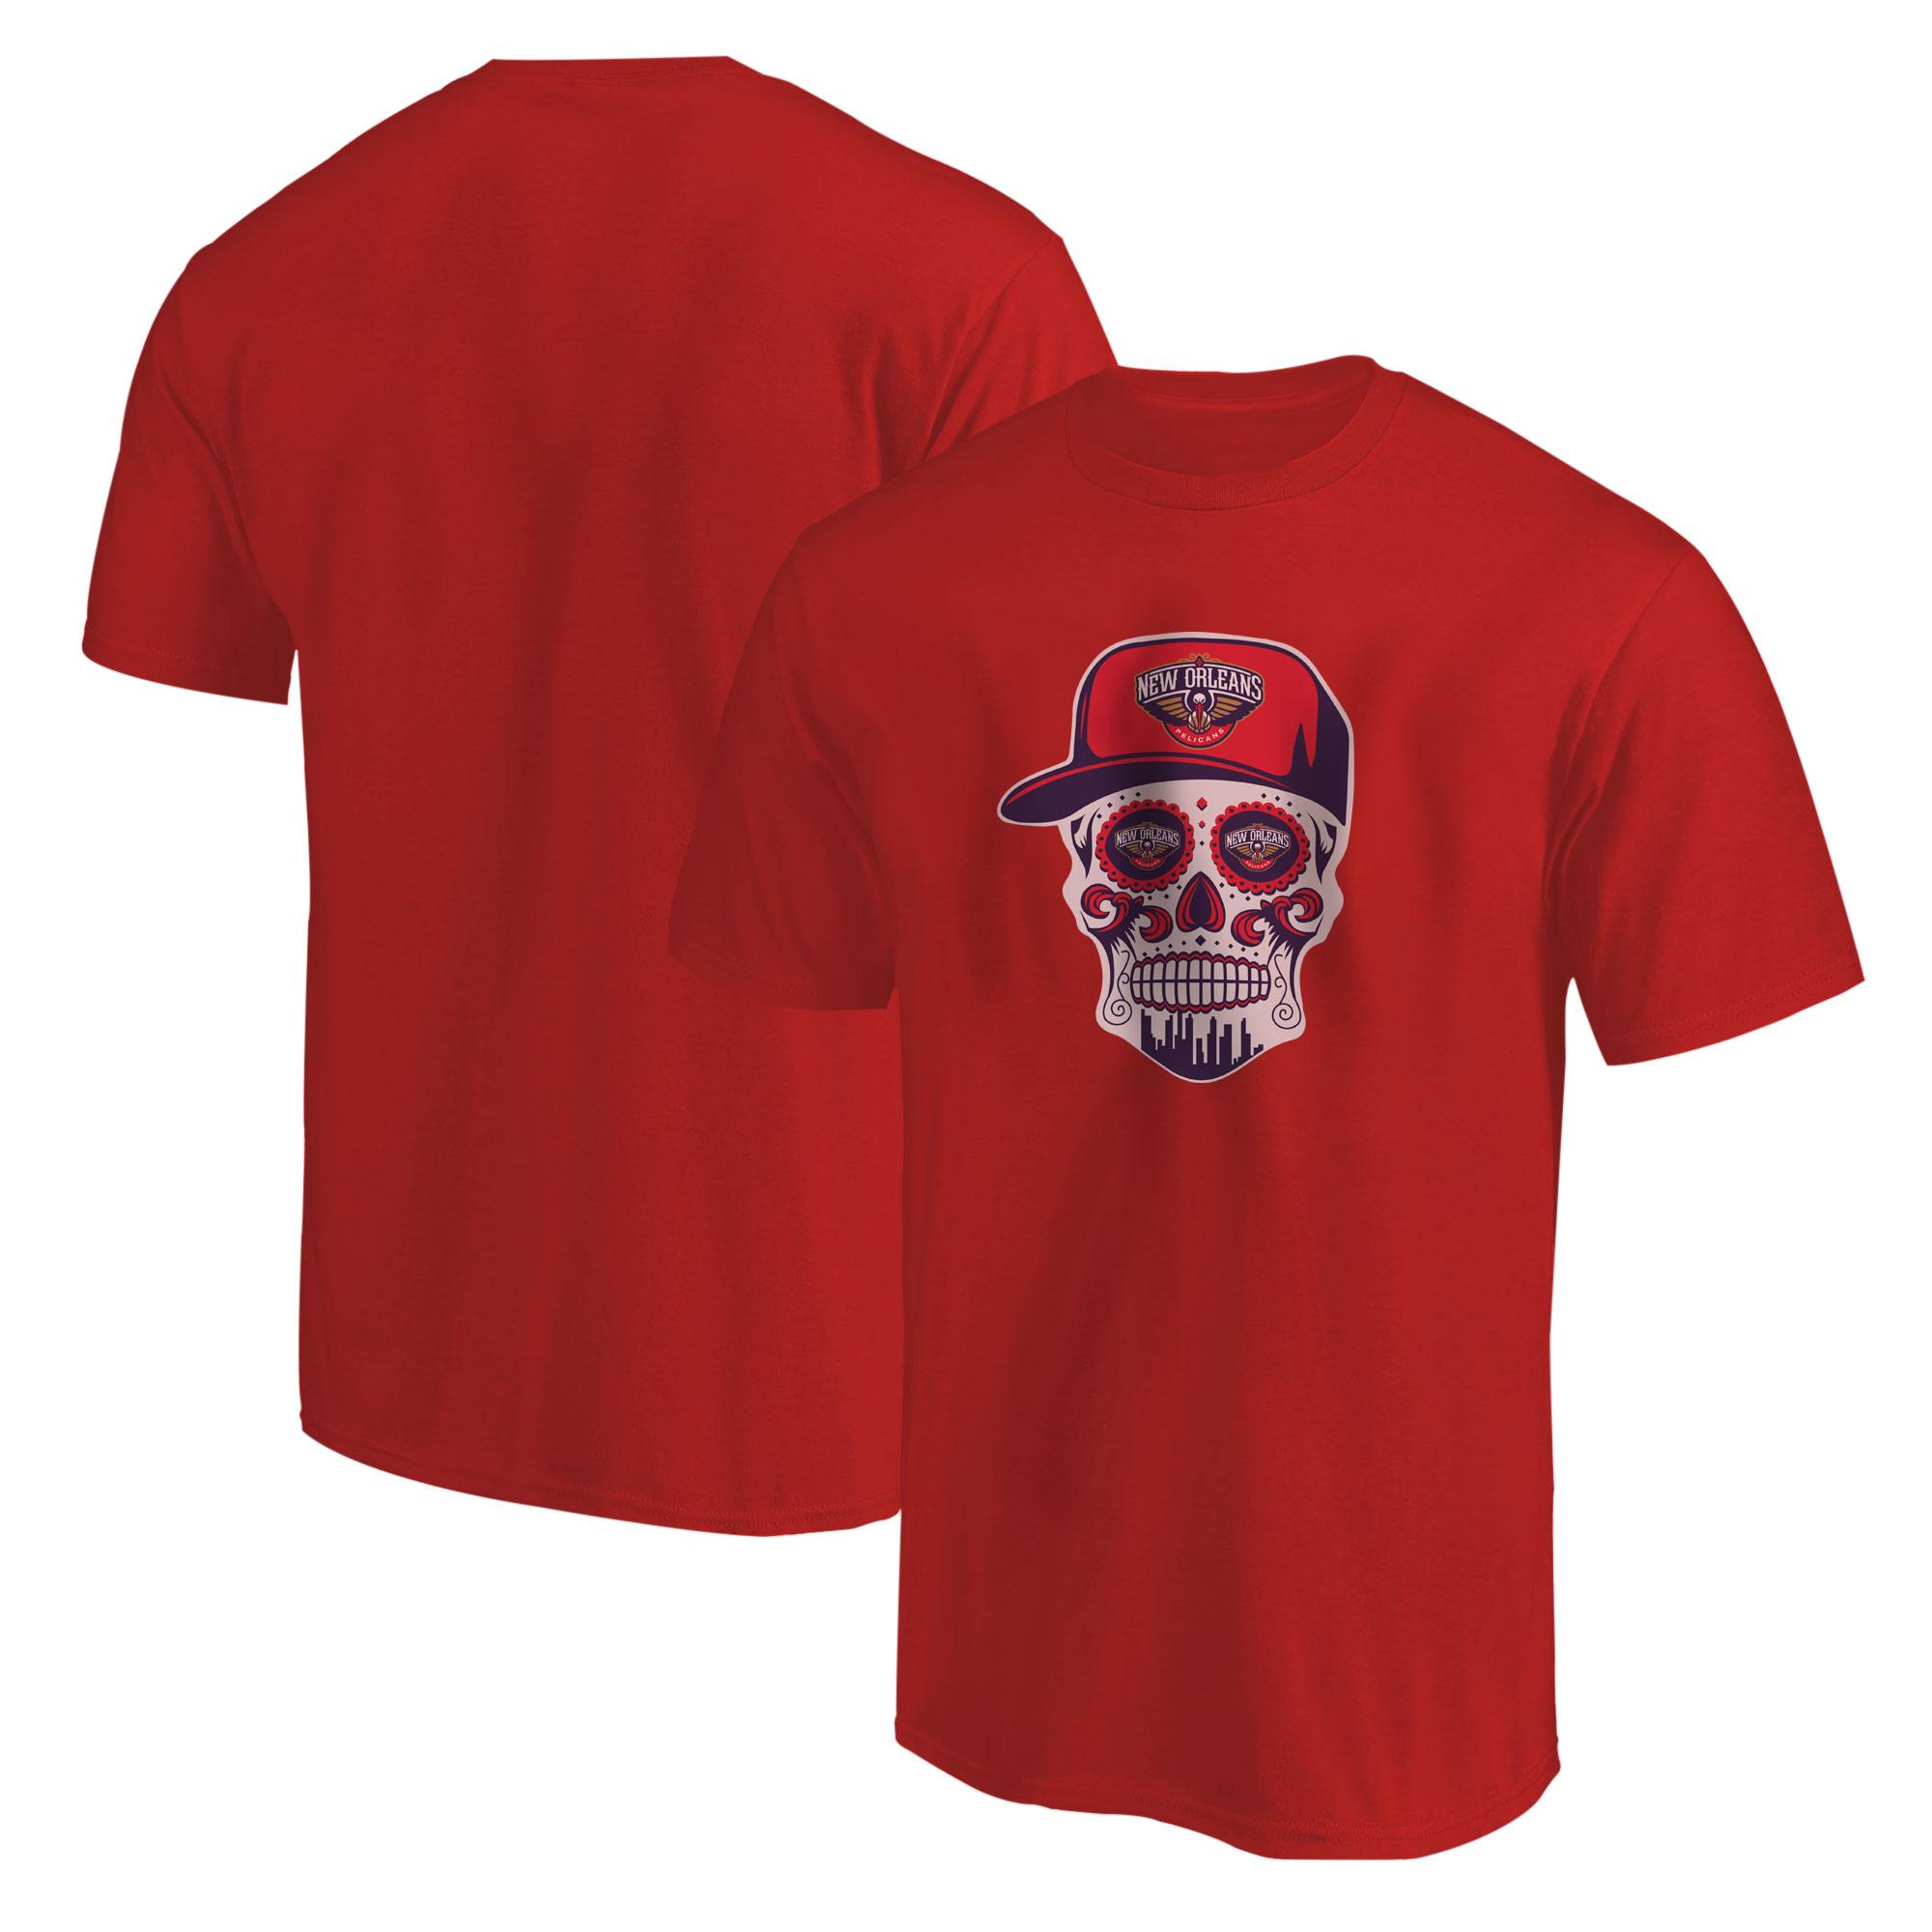 Pelicans Skull  Tshirt (TSH-RED-NP-460-NBA-NOLA-SKULL)